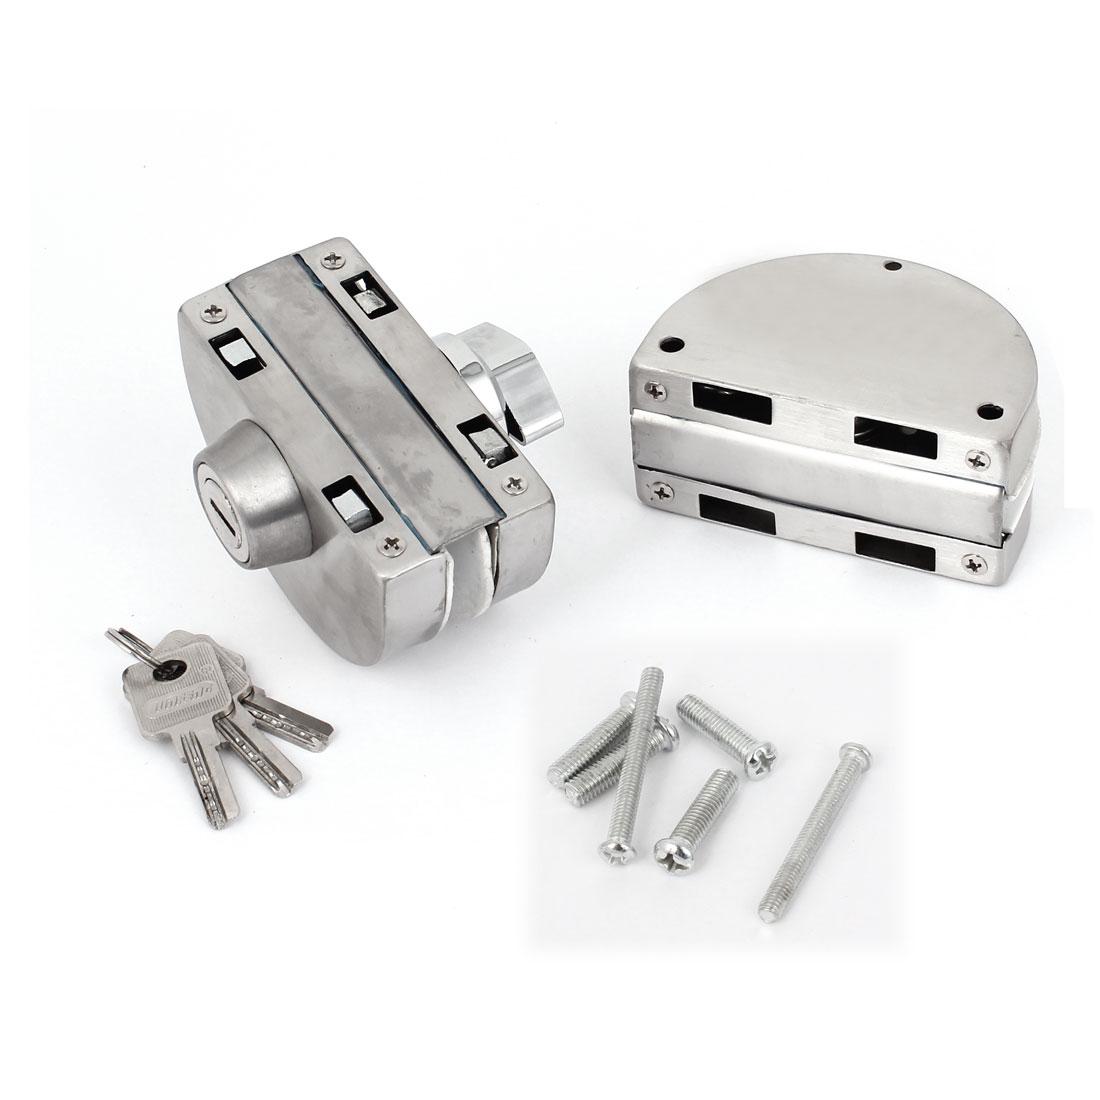 ФОТО UXCELL Main Material Entry Gate Dual Bolt 10-12Mm Swing Push Sliding Glass Door Lock W Keys Metal